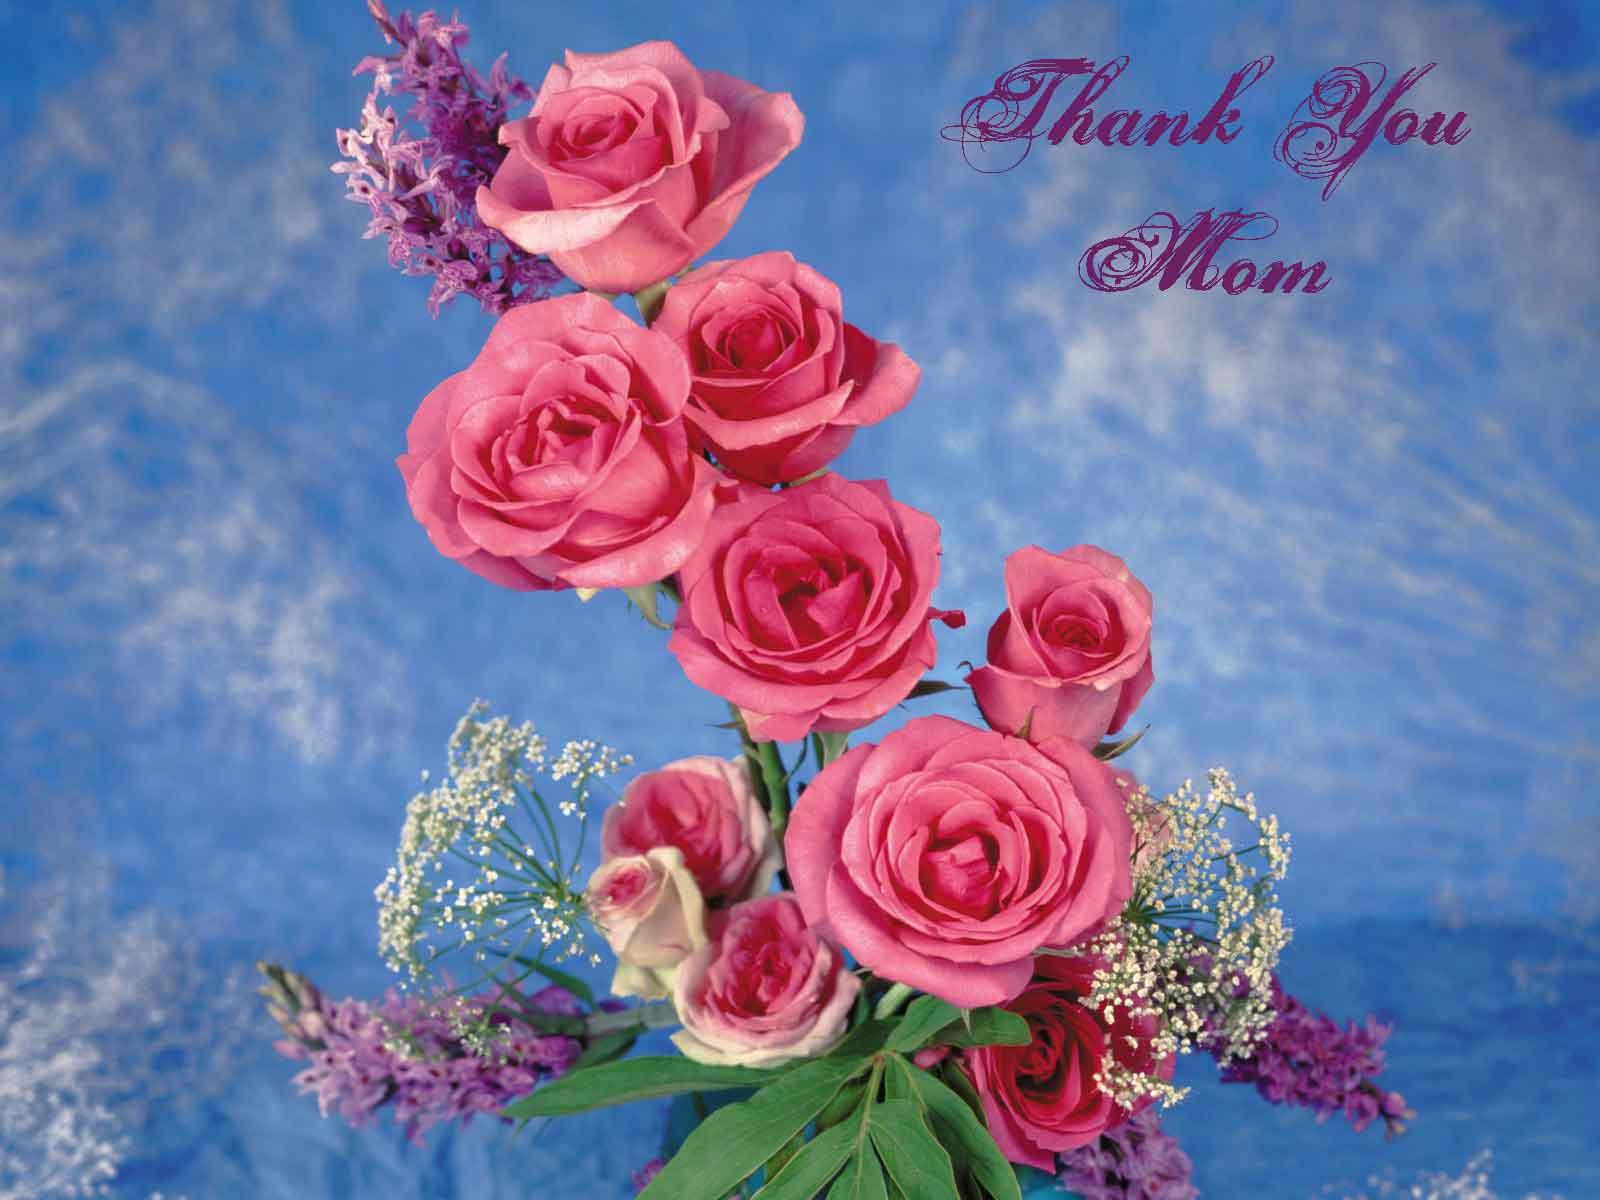 Wallpaper download free image search hd - Independence Free Mothers Day Wallpaper Download Desktop